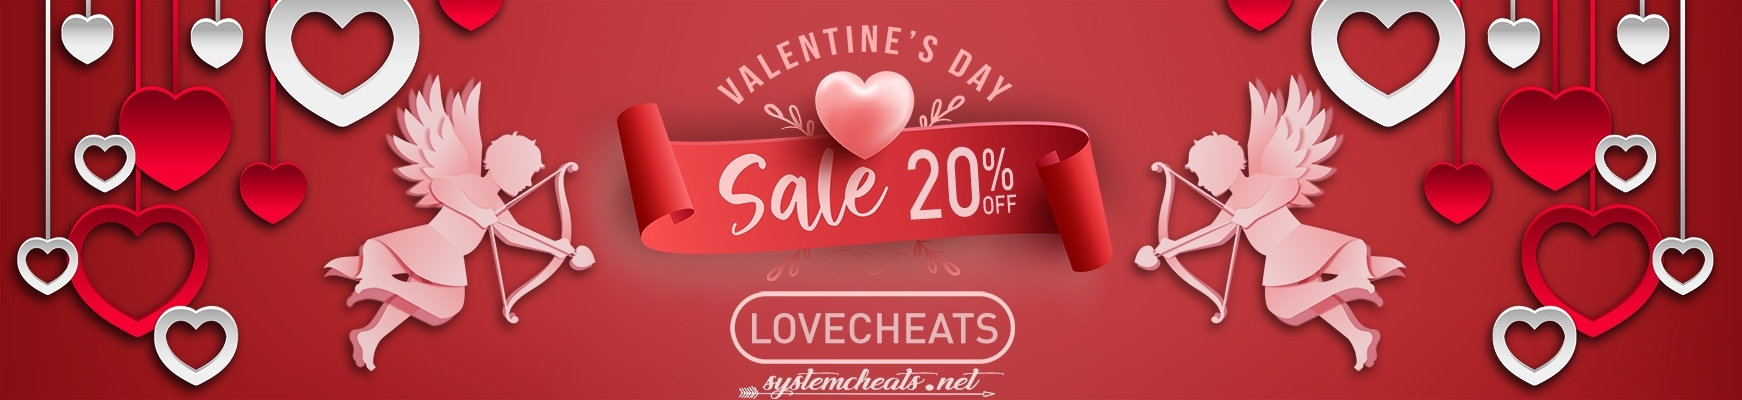 Valentine's Sale 20% Discount! (Expired)